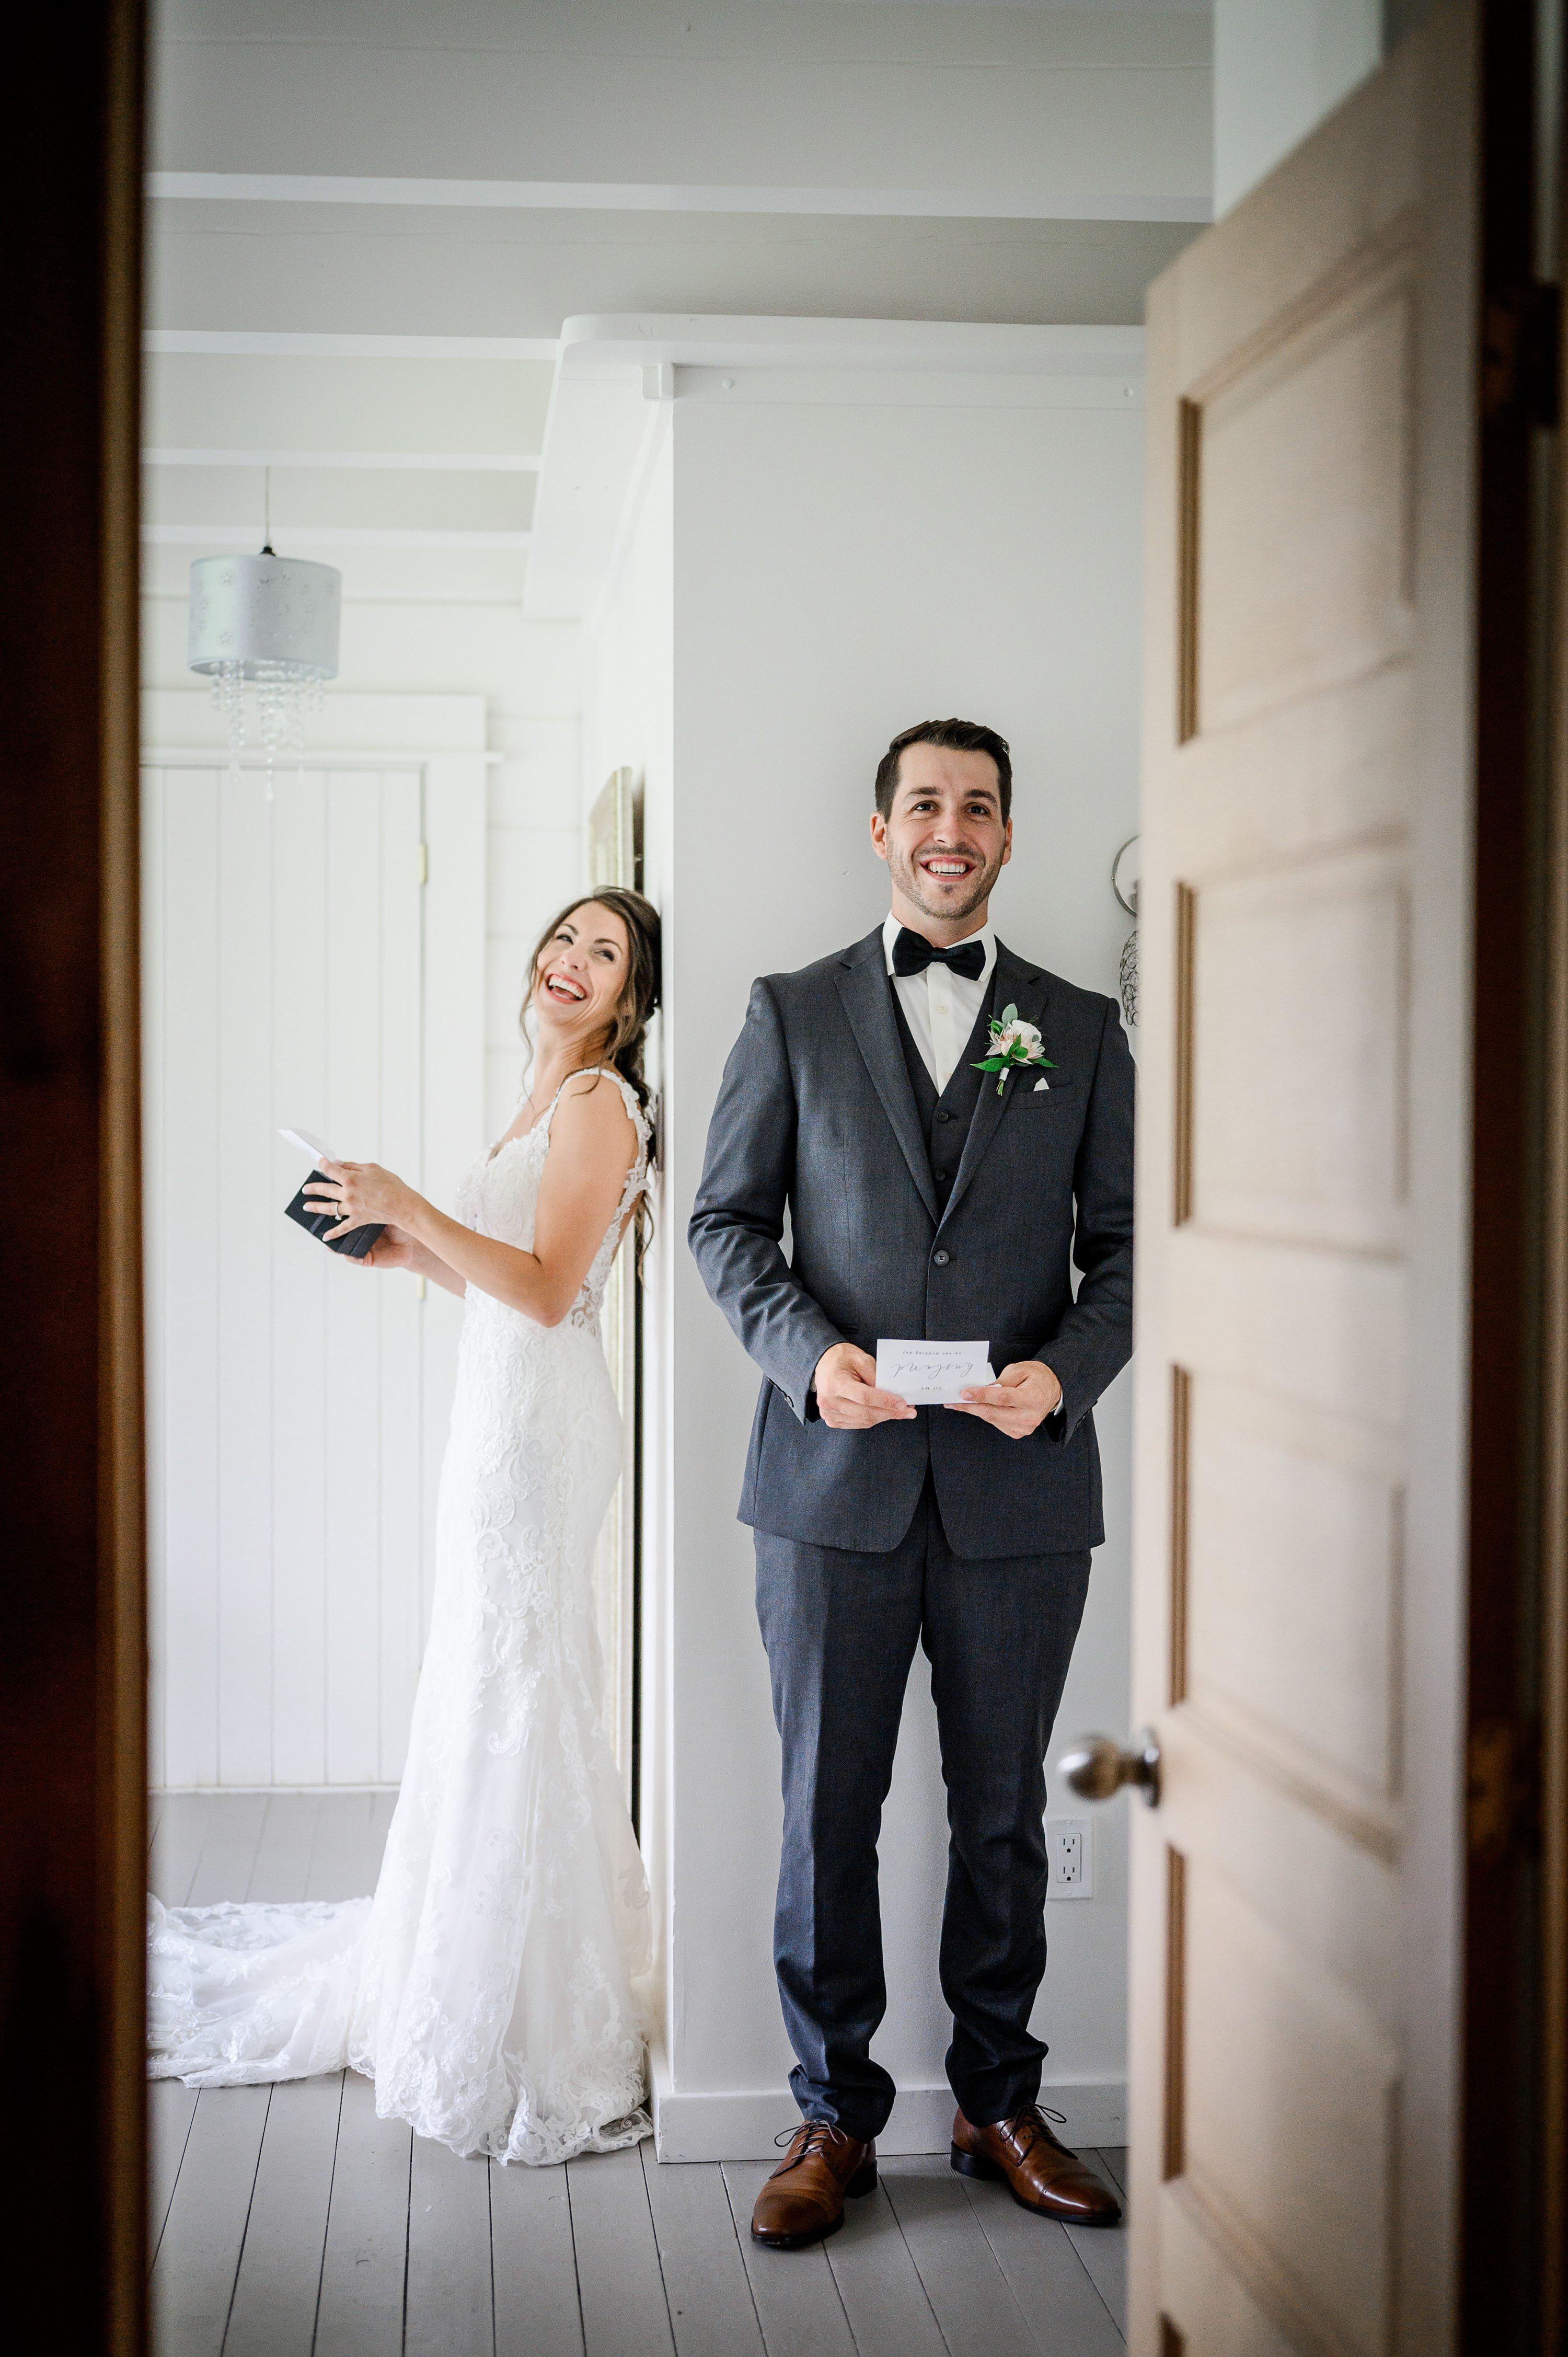 wedding vendors,blue-grey bridesmaids